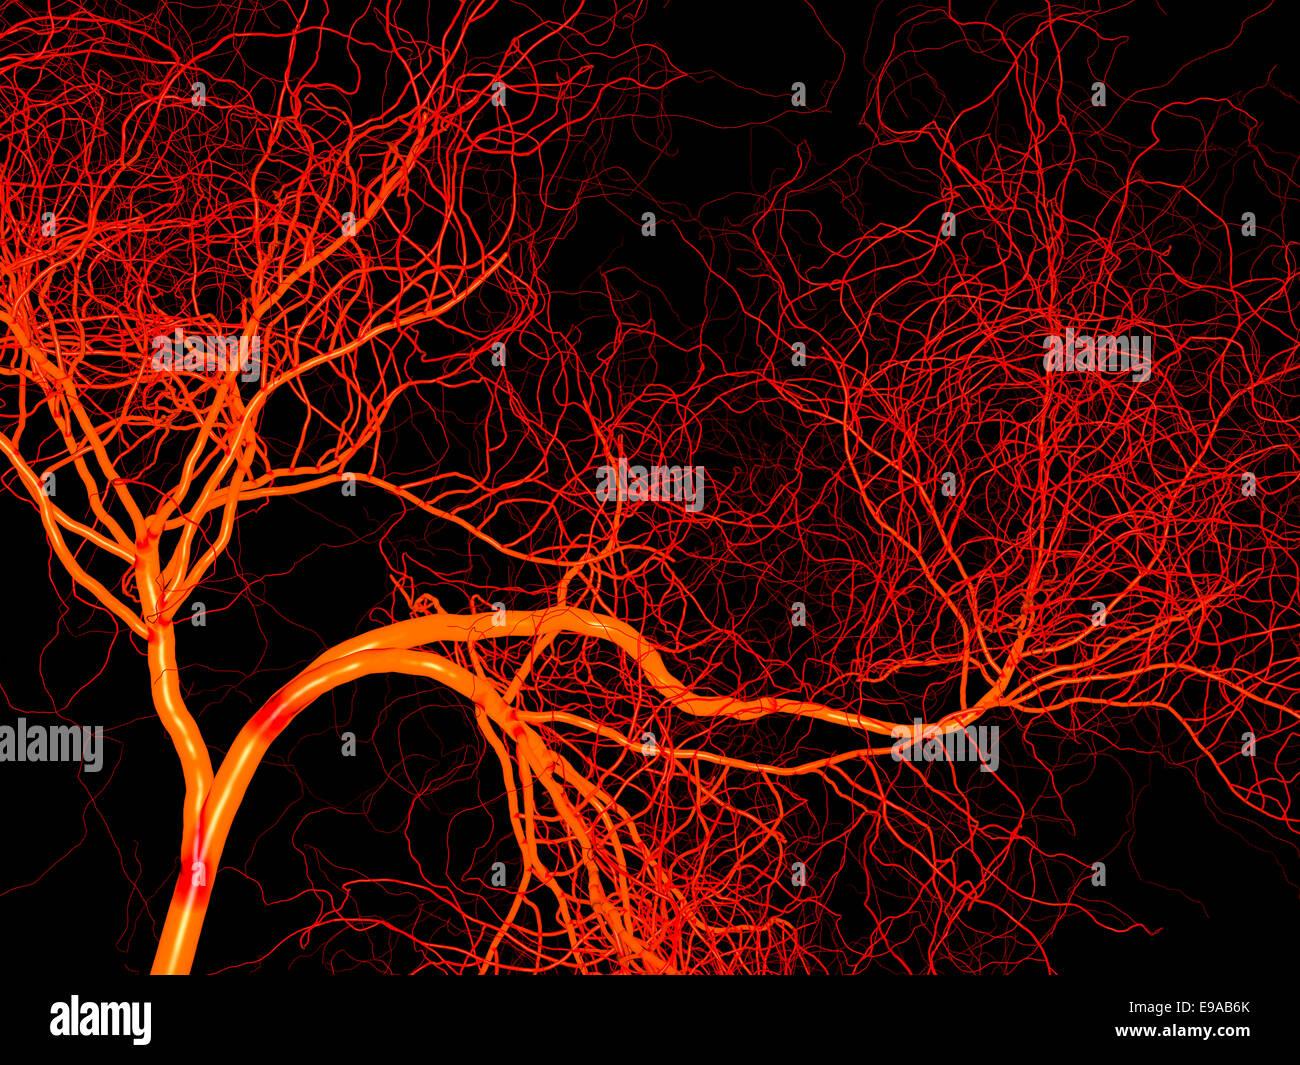 Nervous or blood system of artery and vein. Medical 3d illustration - Stock Image